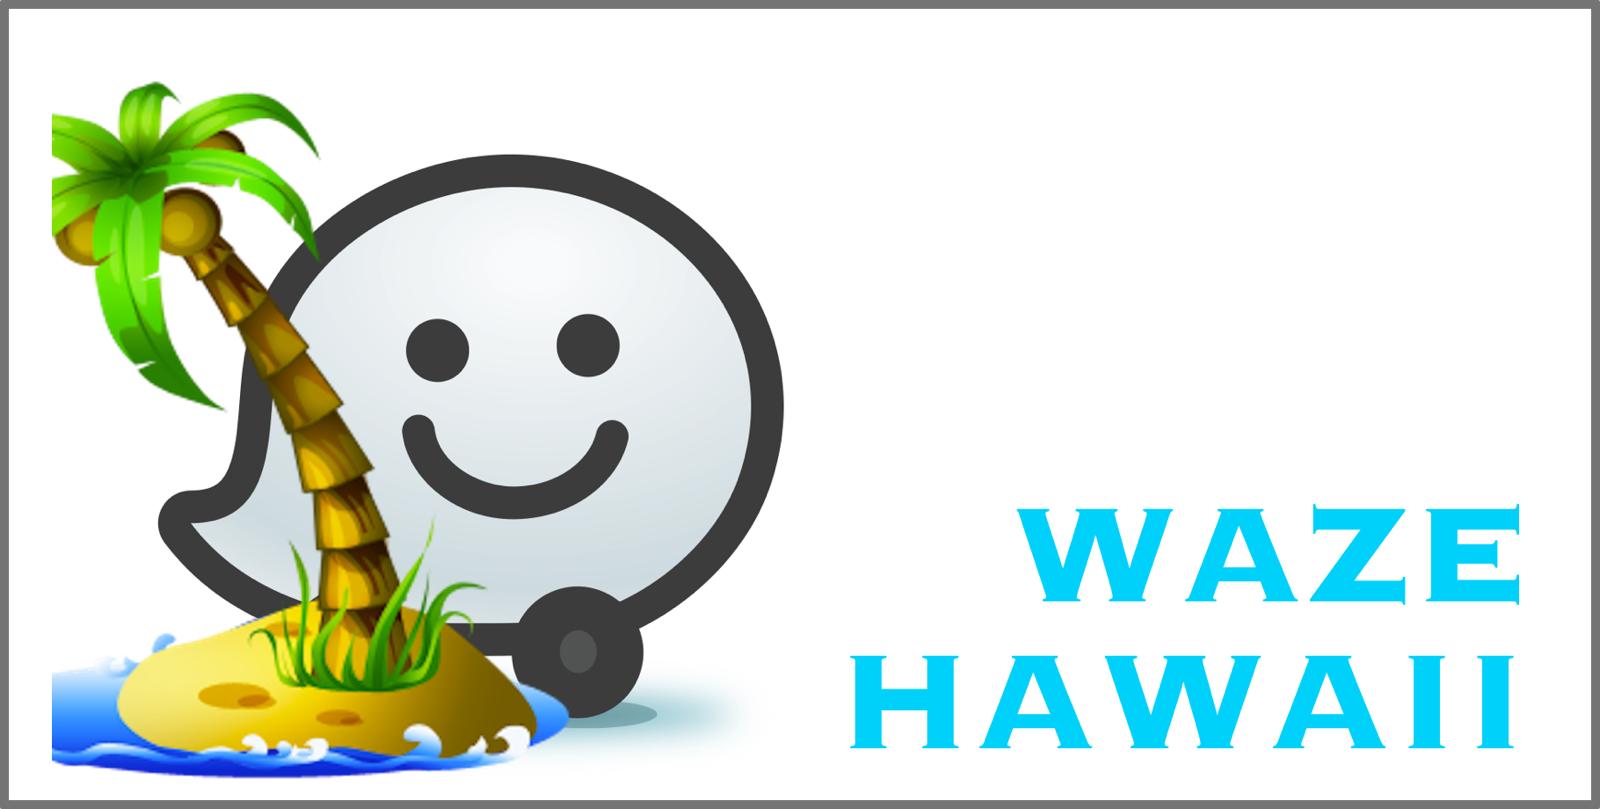 Waze Hawaii